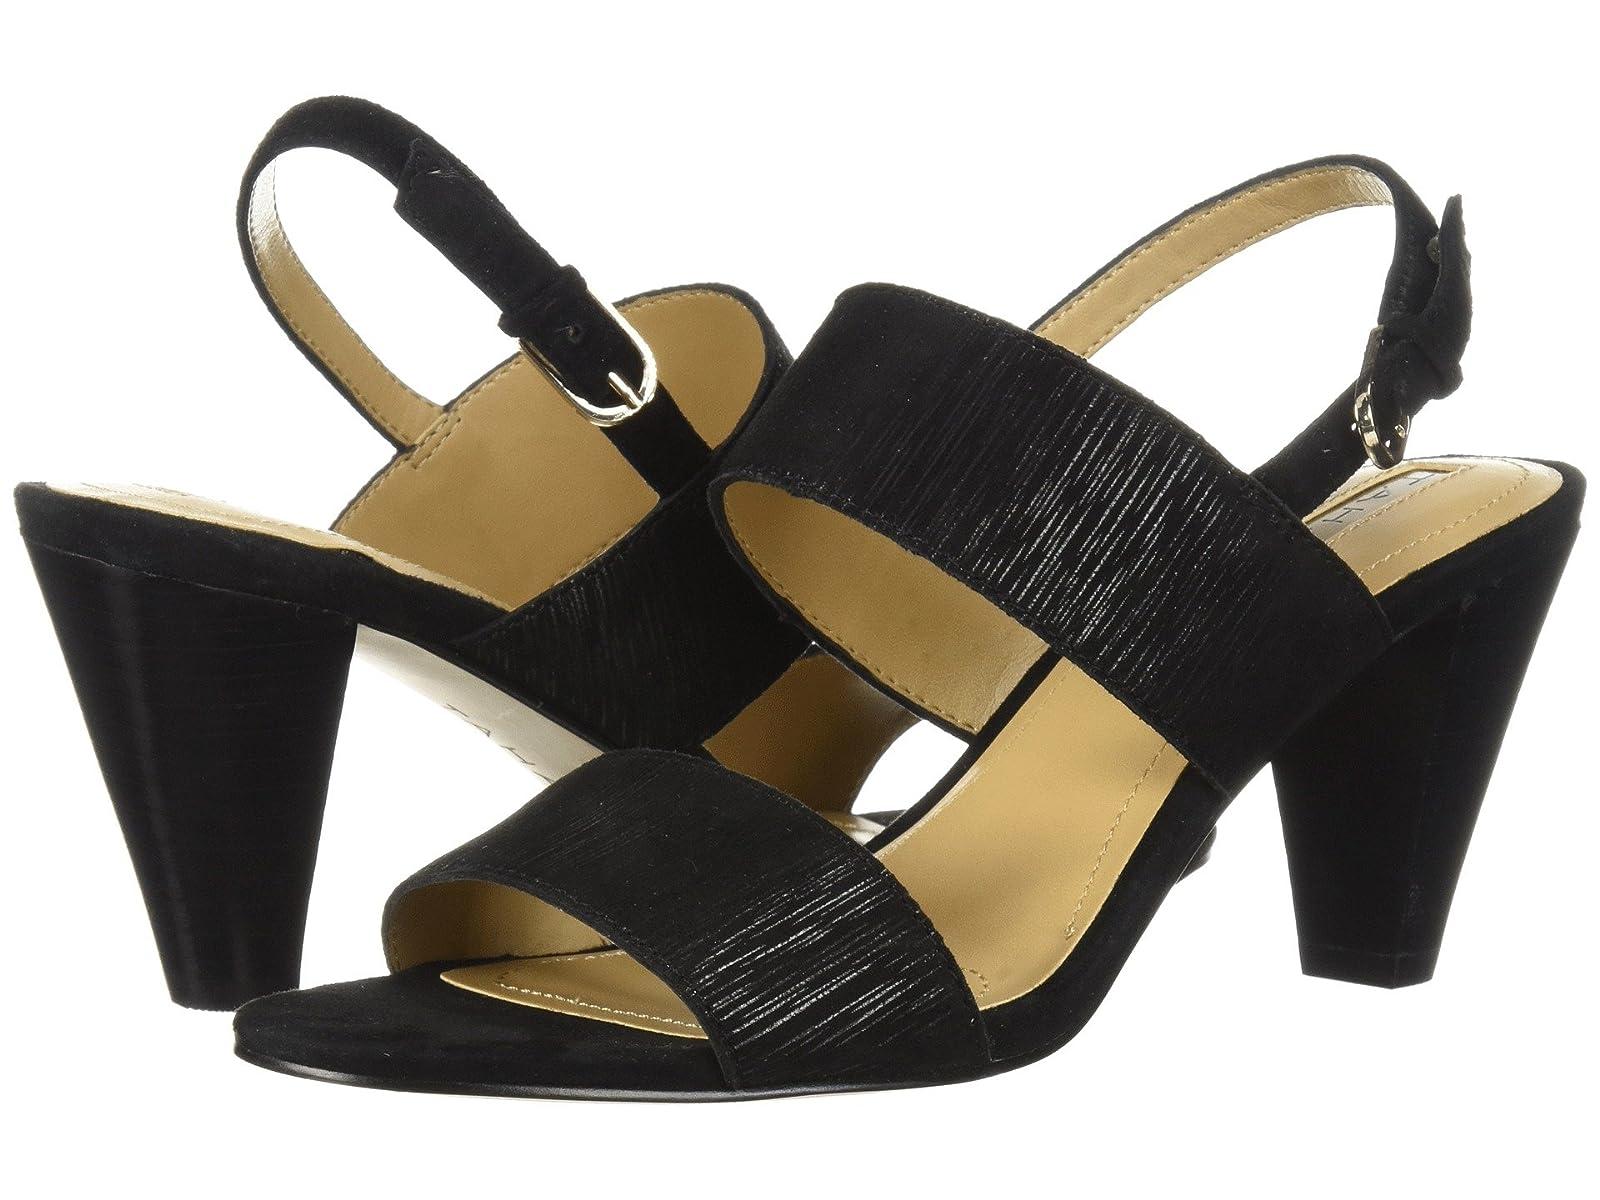 Tahari EasyAtmospheric grades have affordable shoes